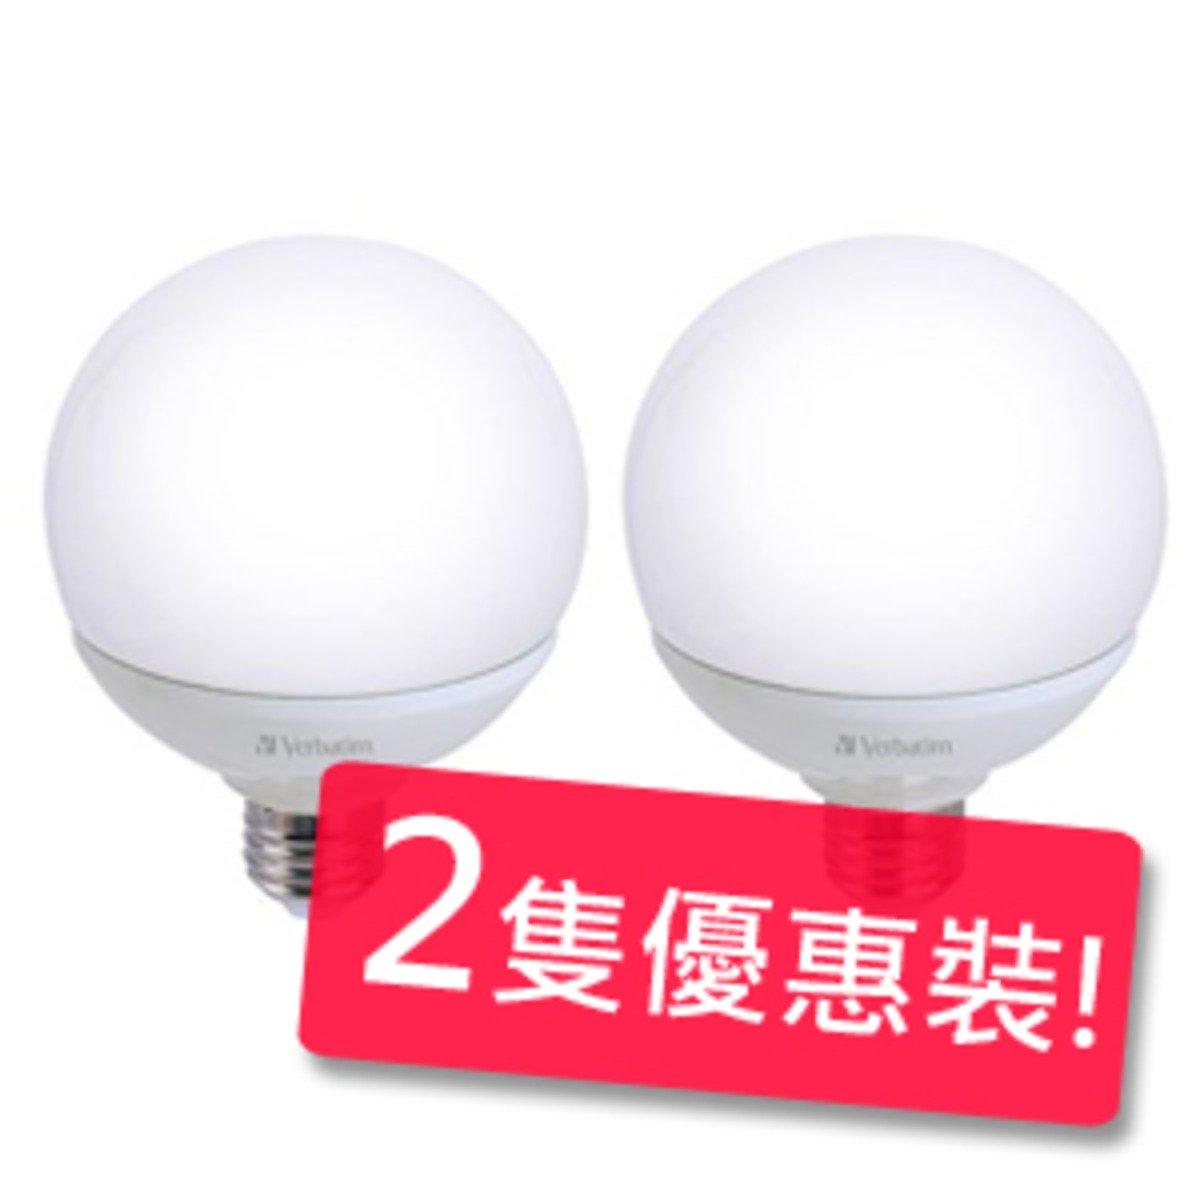 Verbatim 12瓦 E27 480lm 3000k 燈泡 (暖白) 2隻優惠裝